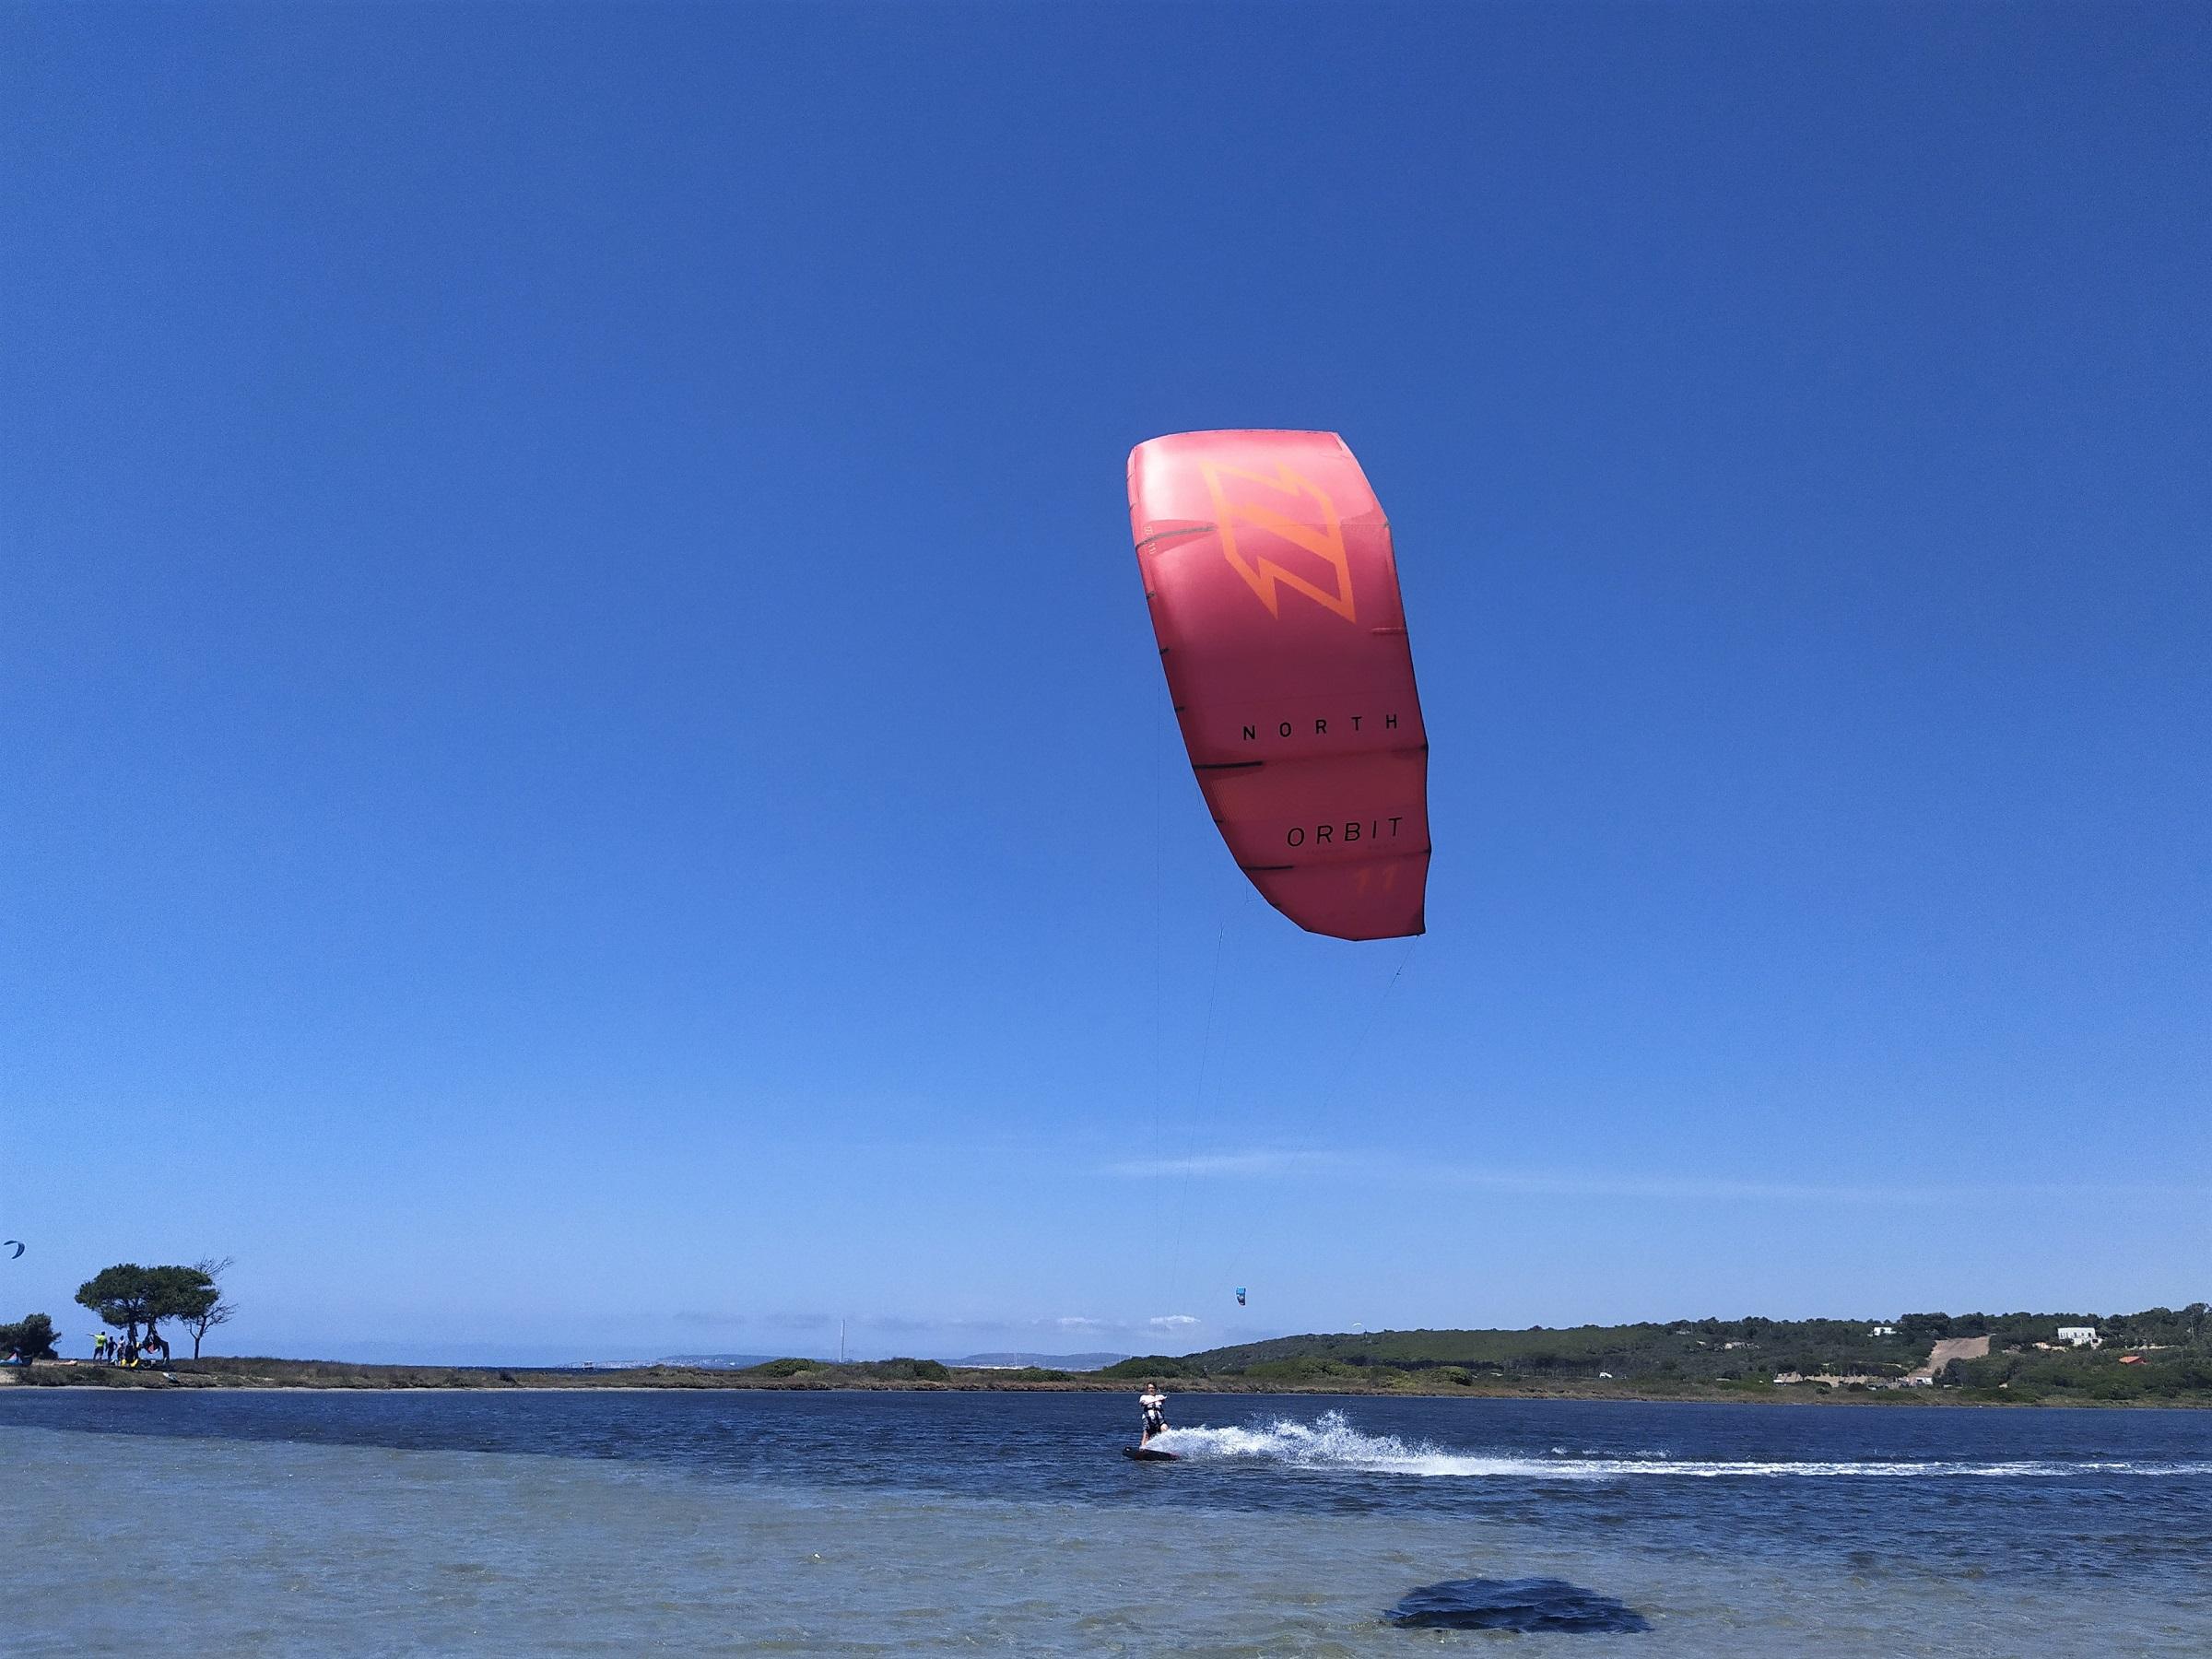 Kitesurf in Punta Trettu, the best kite spot of Sardinia